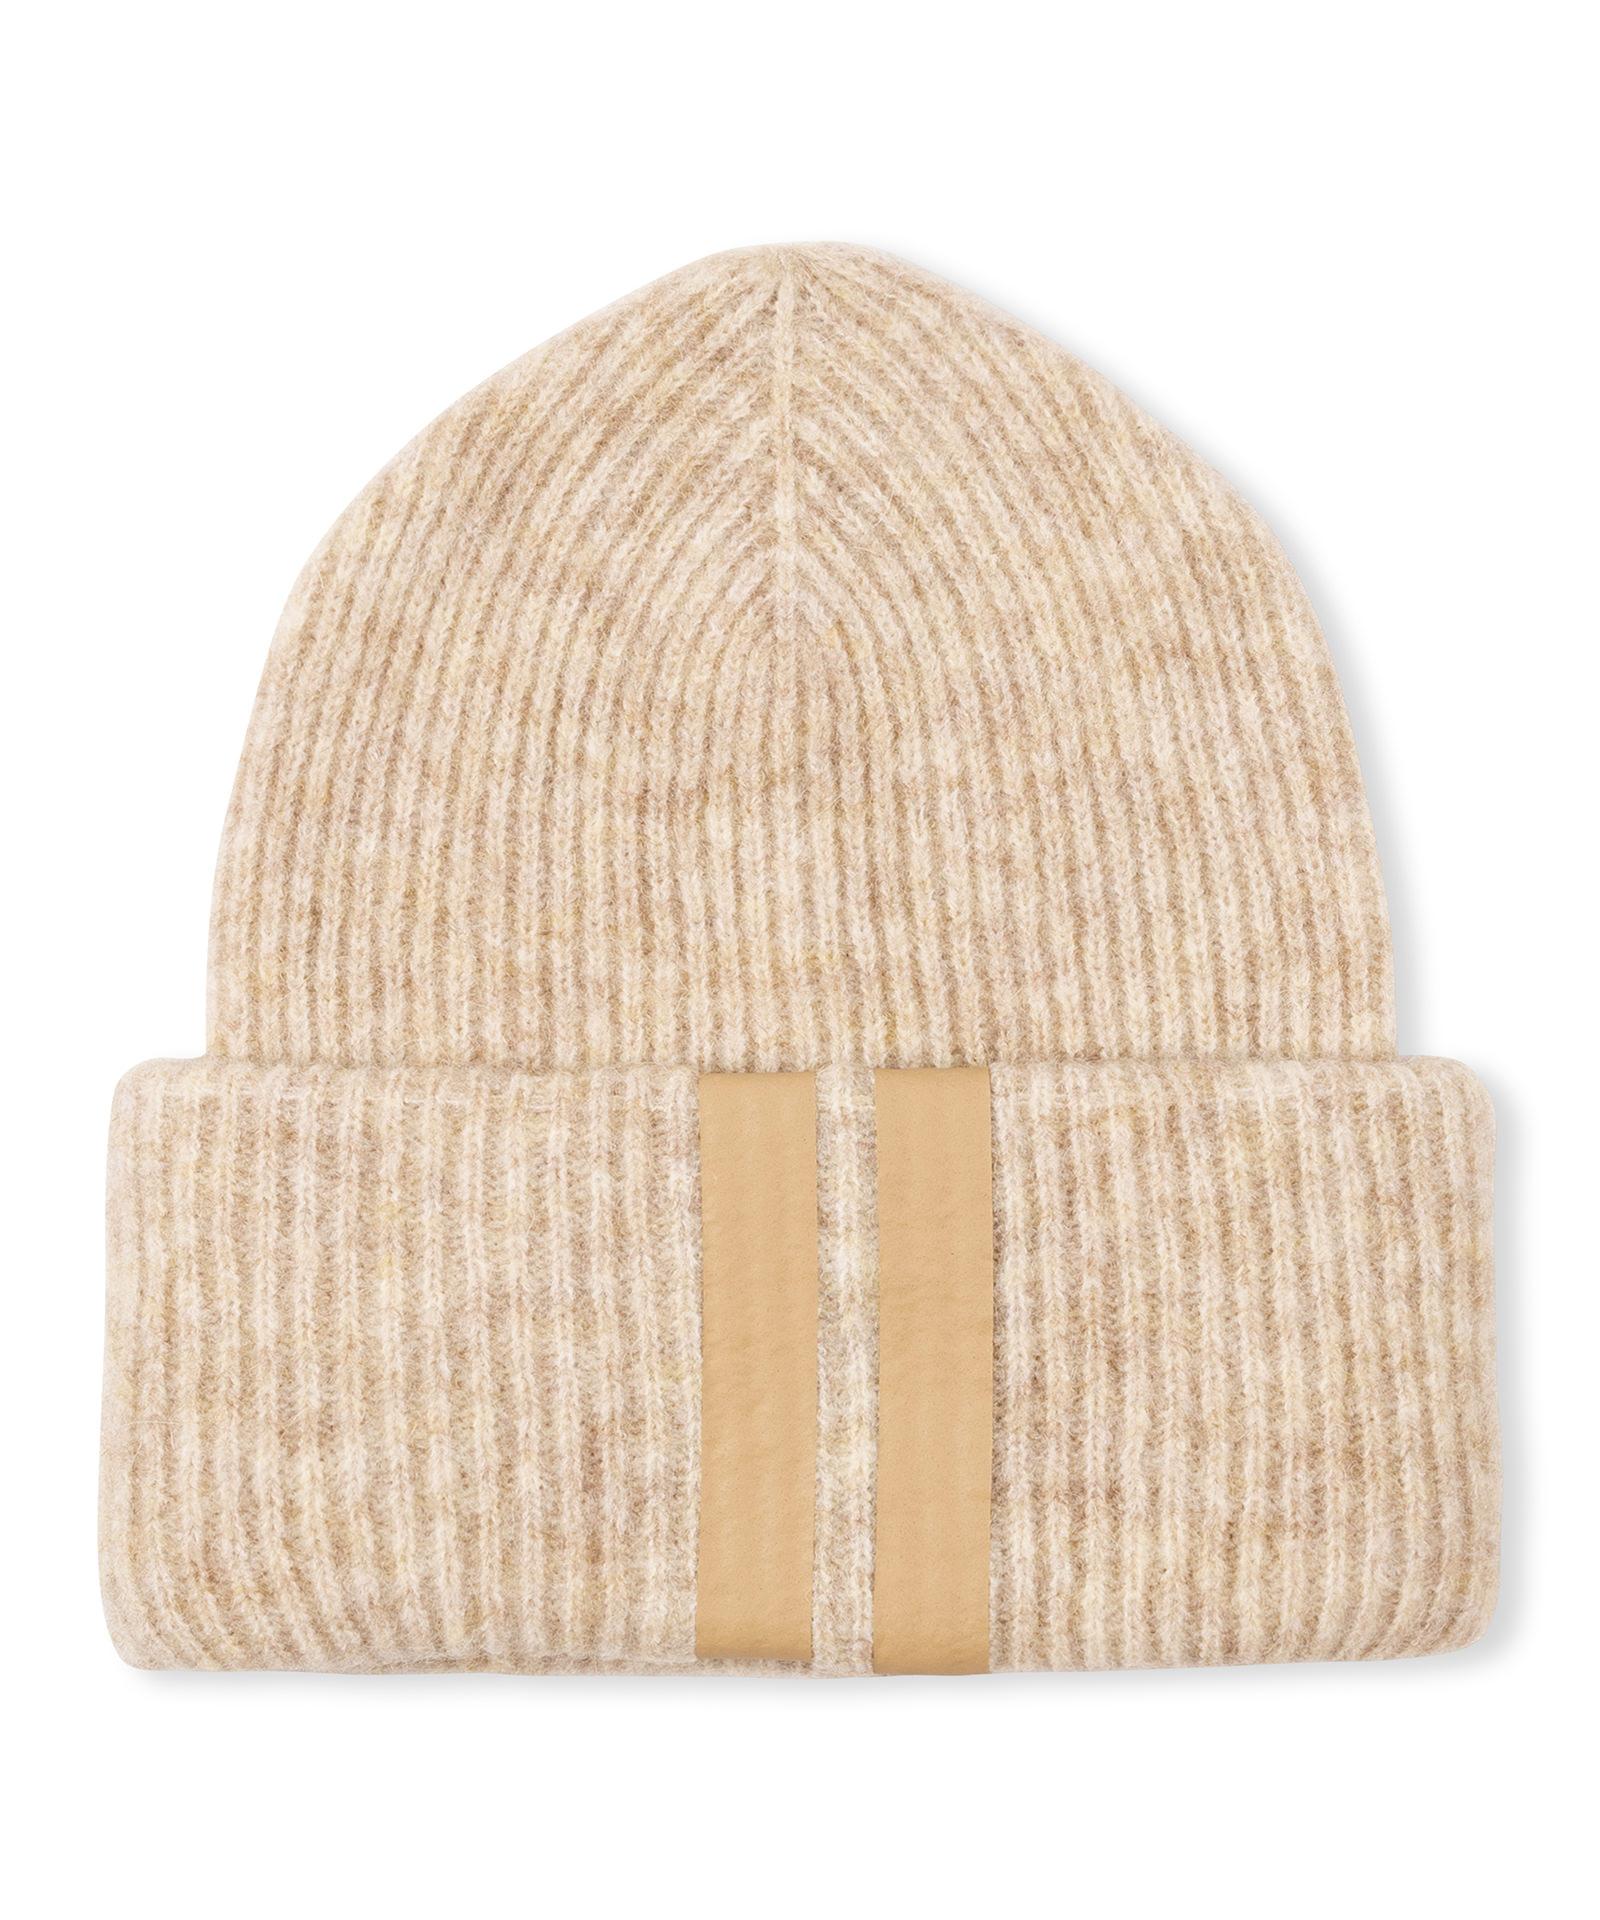 Soft Knit Beanie - Oatmeal